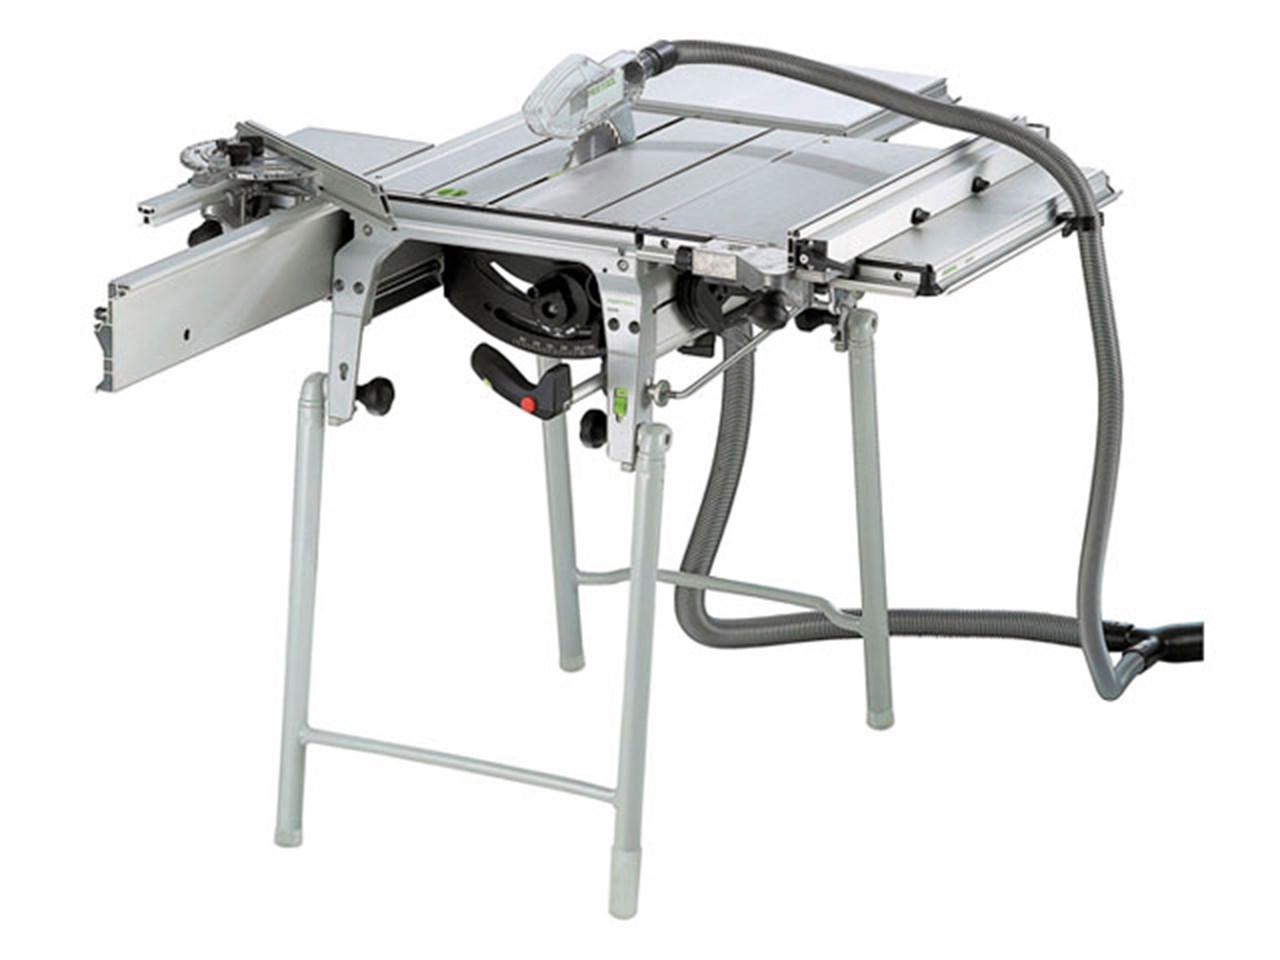 festool cs50 eb set 240v 190mm precisio trimming saw. Black Bedroom Furniture Sets. Home Design Ideas